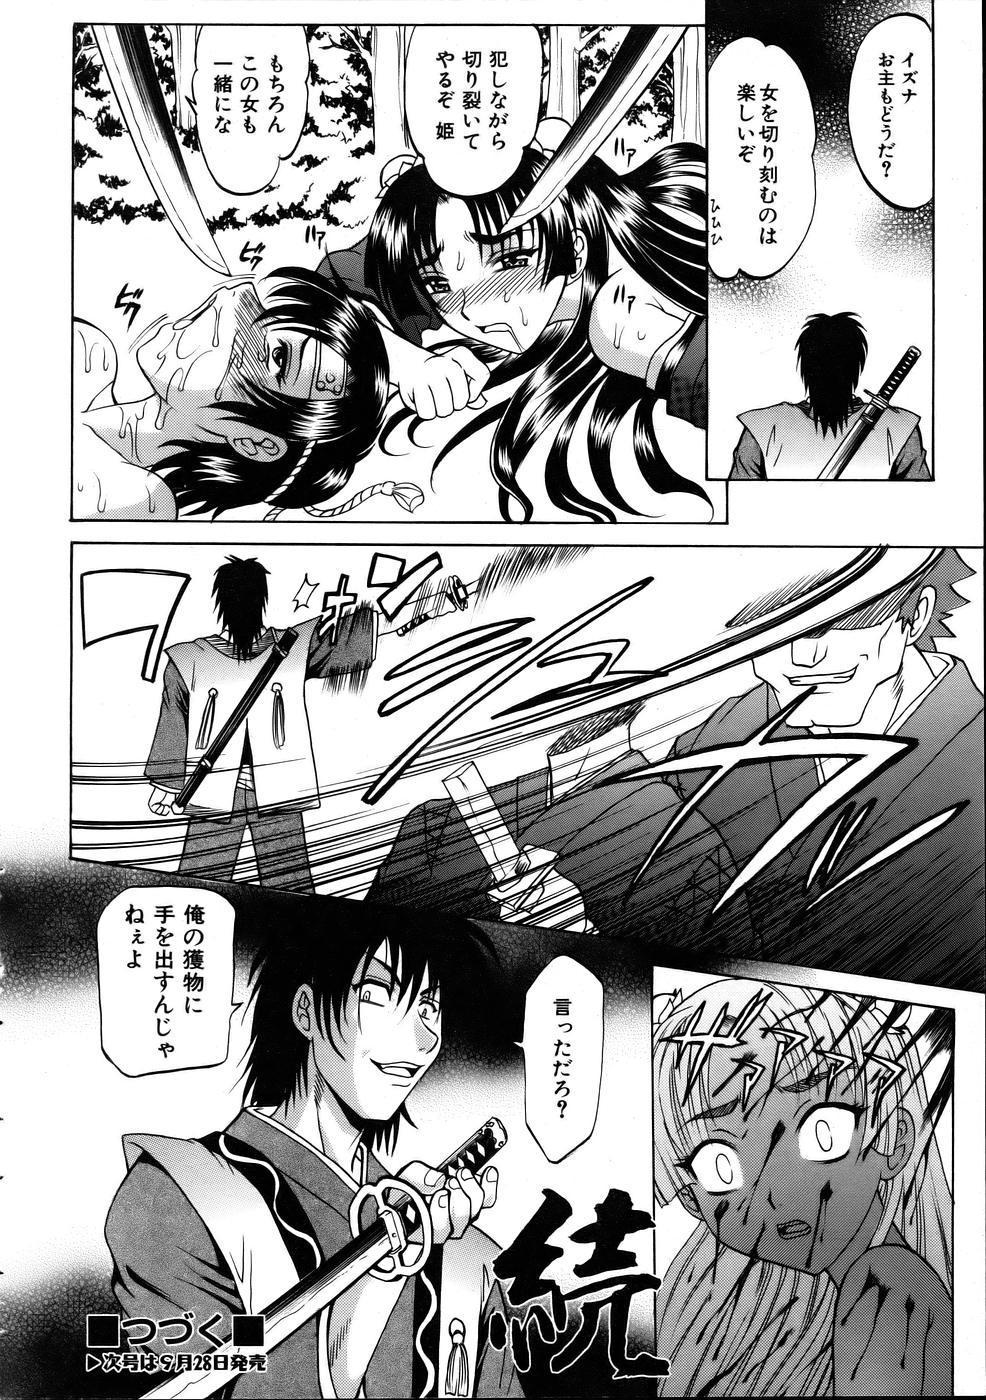 COMIC AUN 2005-10 Vol. 113 77